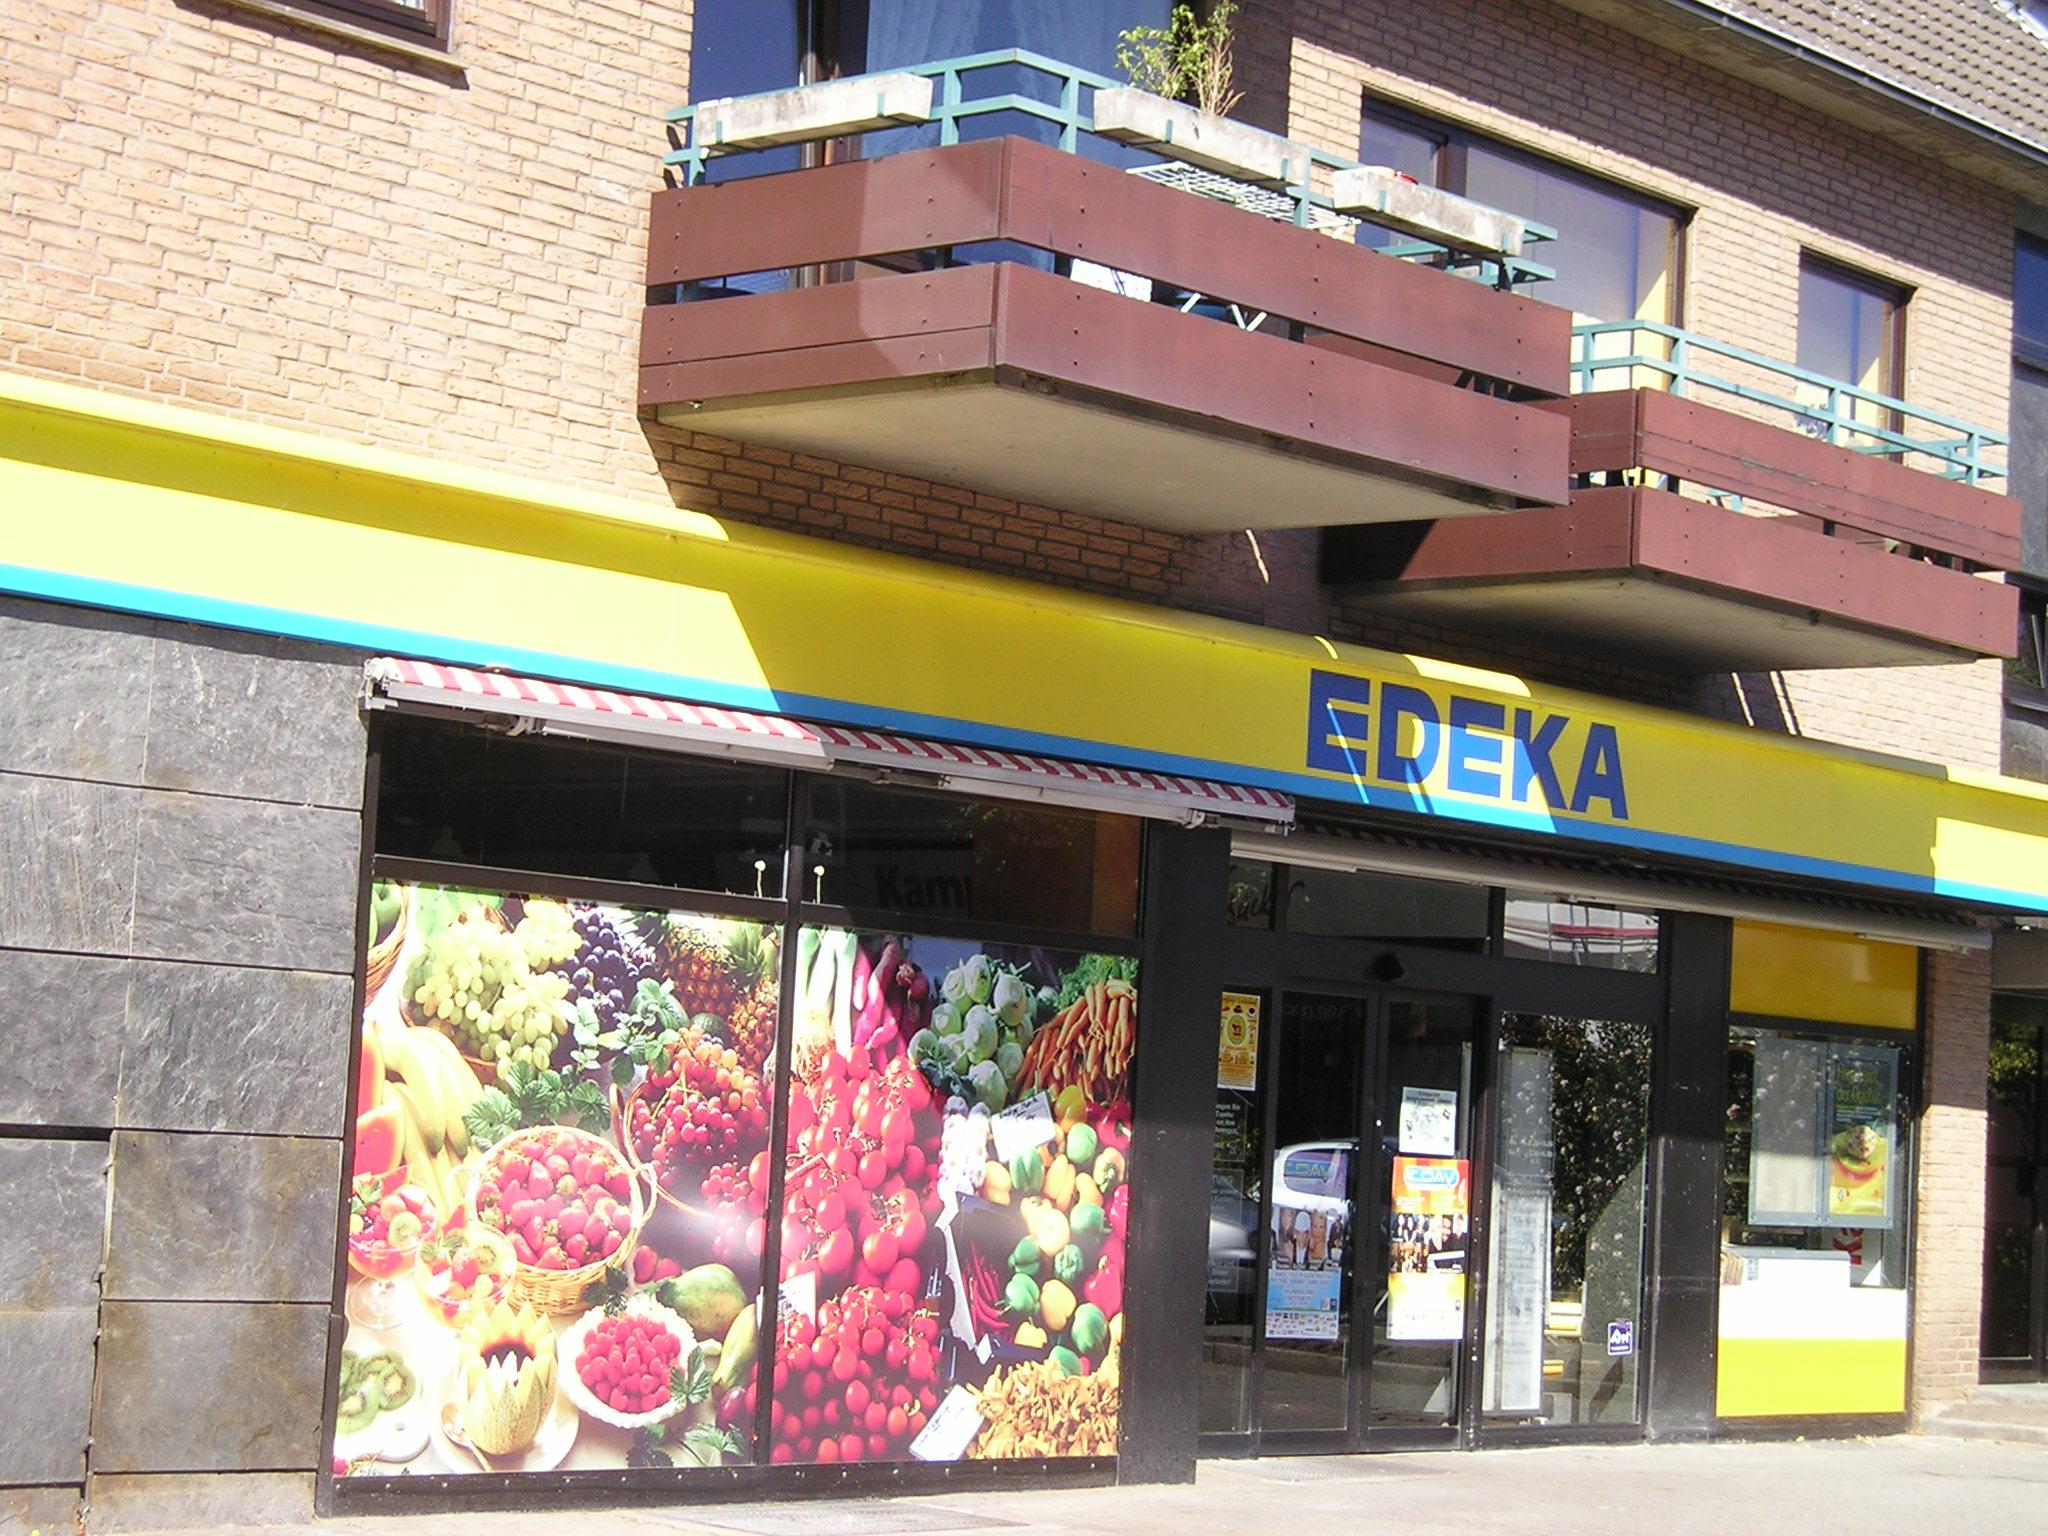 Edeka Markt Düsseldorf